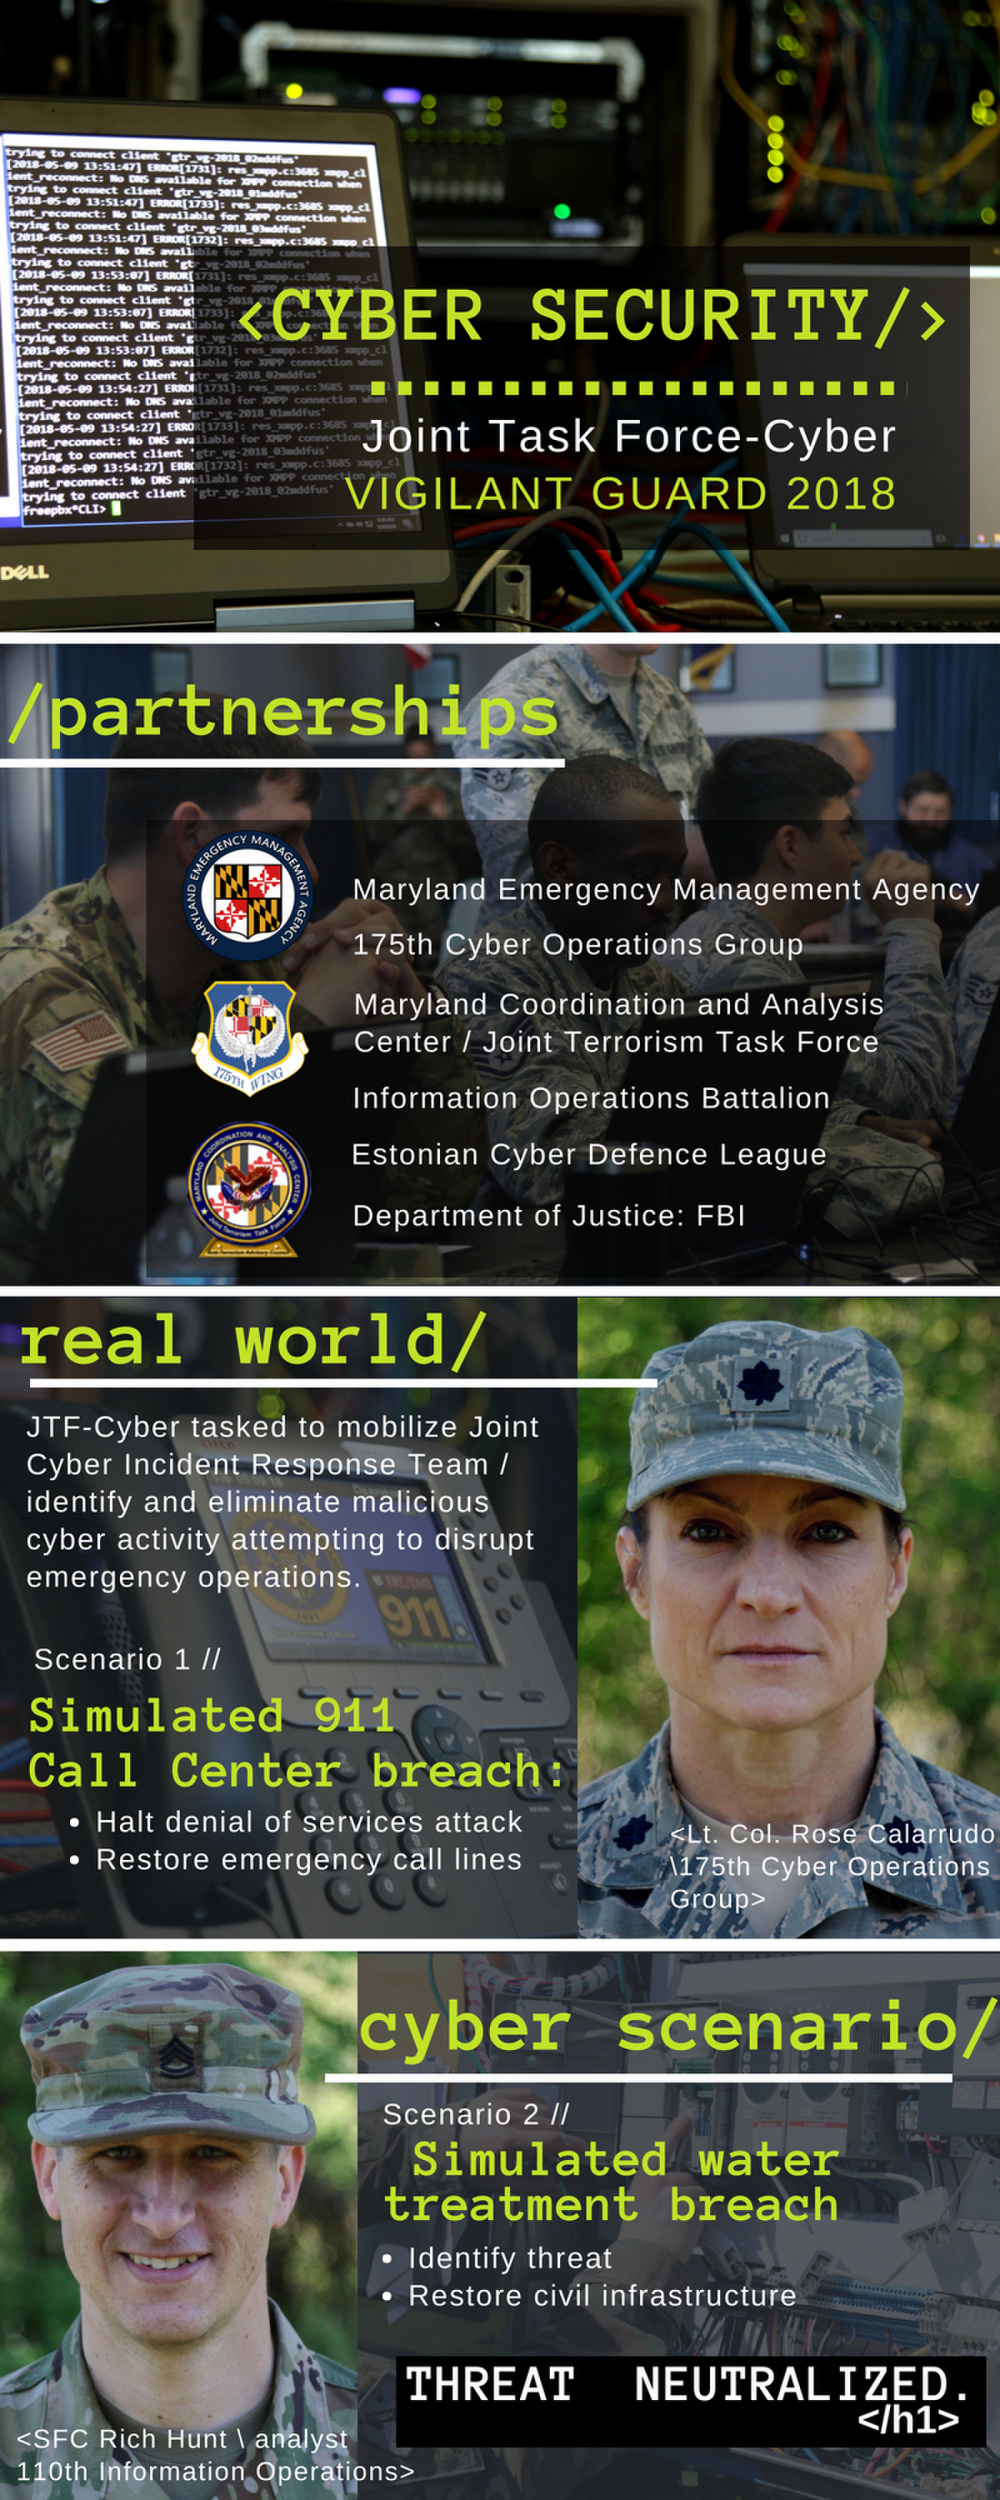 Joint Task Force-Cyber at Vigilant Guard 2018